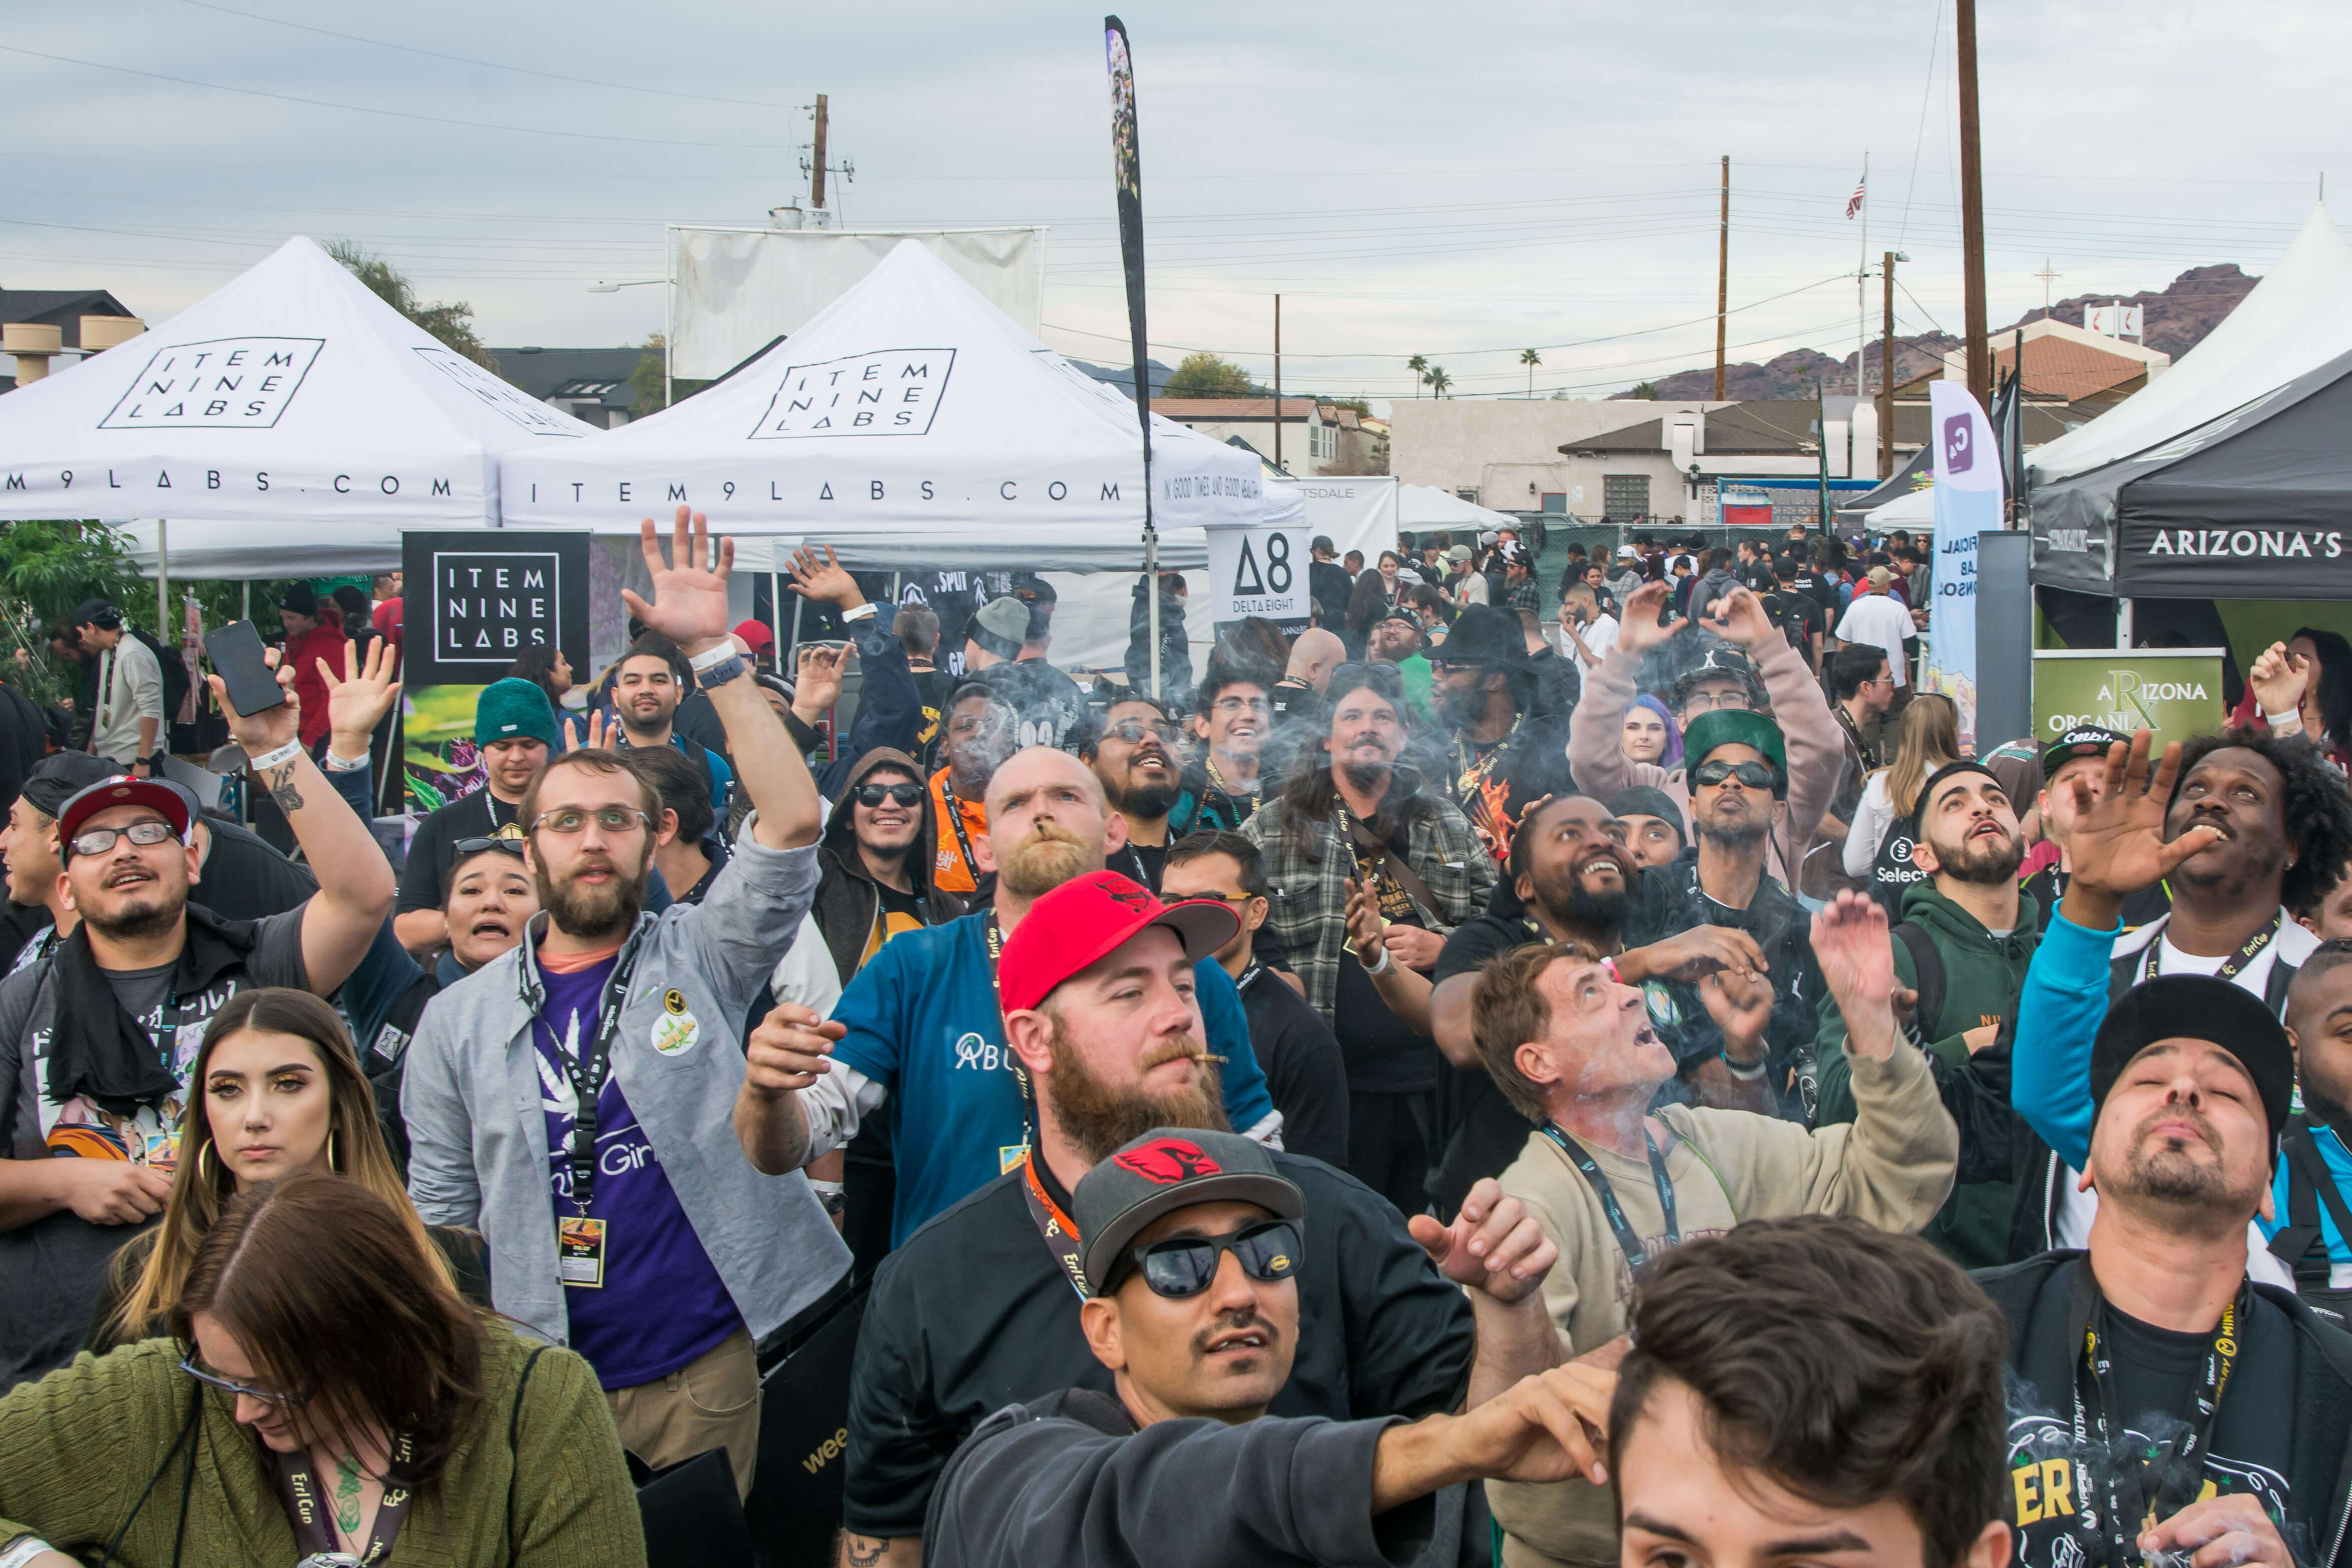 Arizona Cannabis Events and Awards Festivals